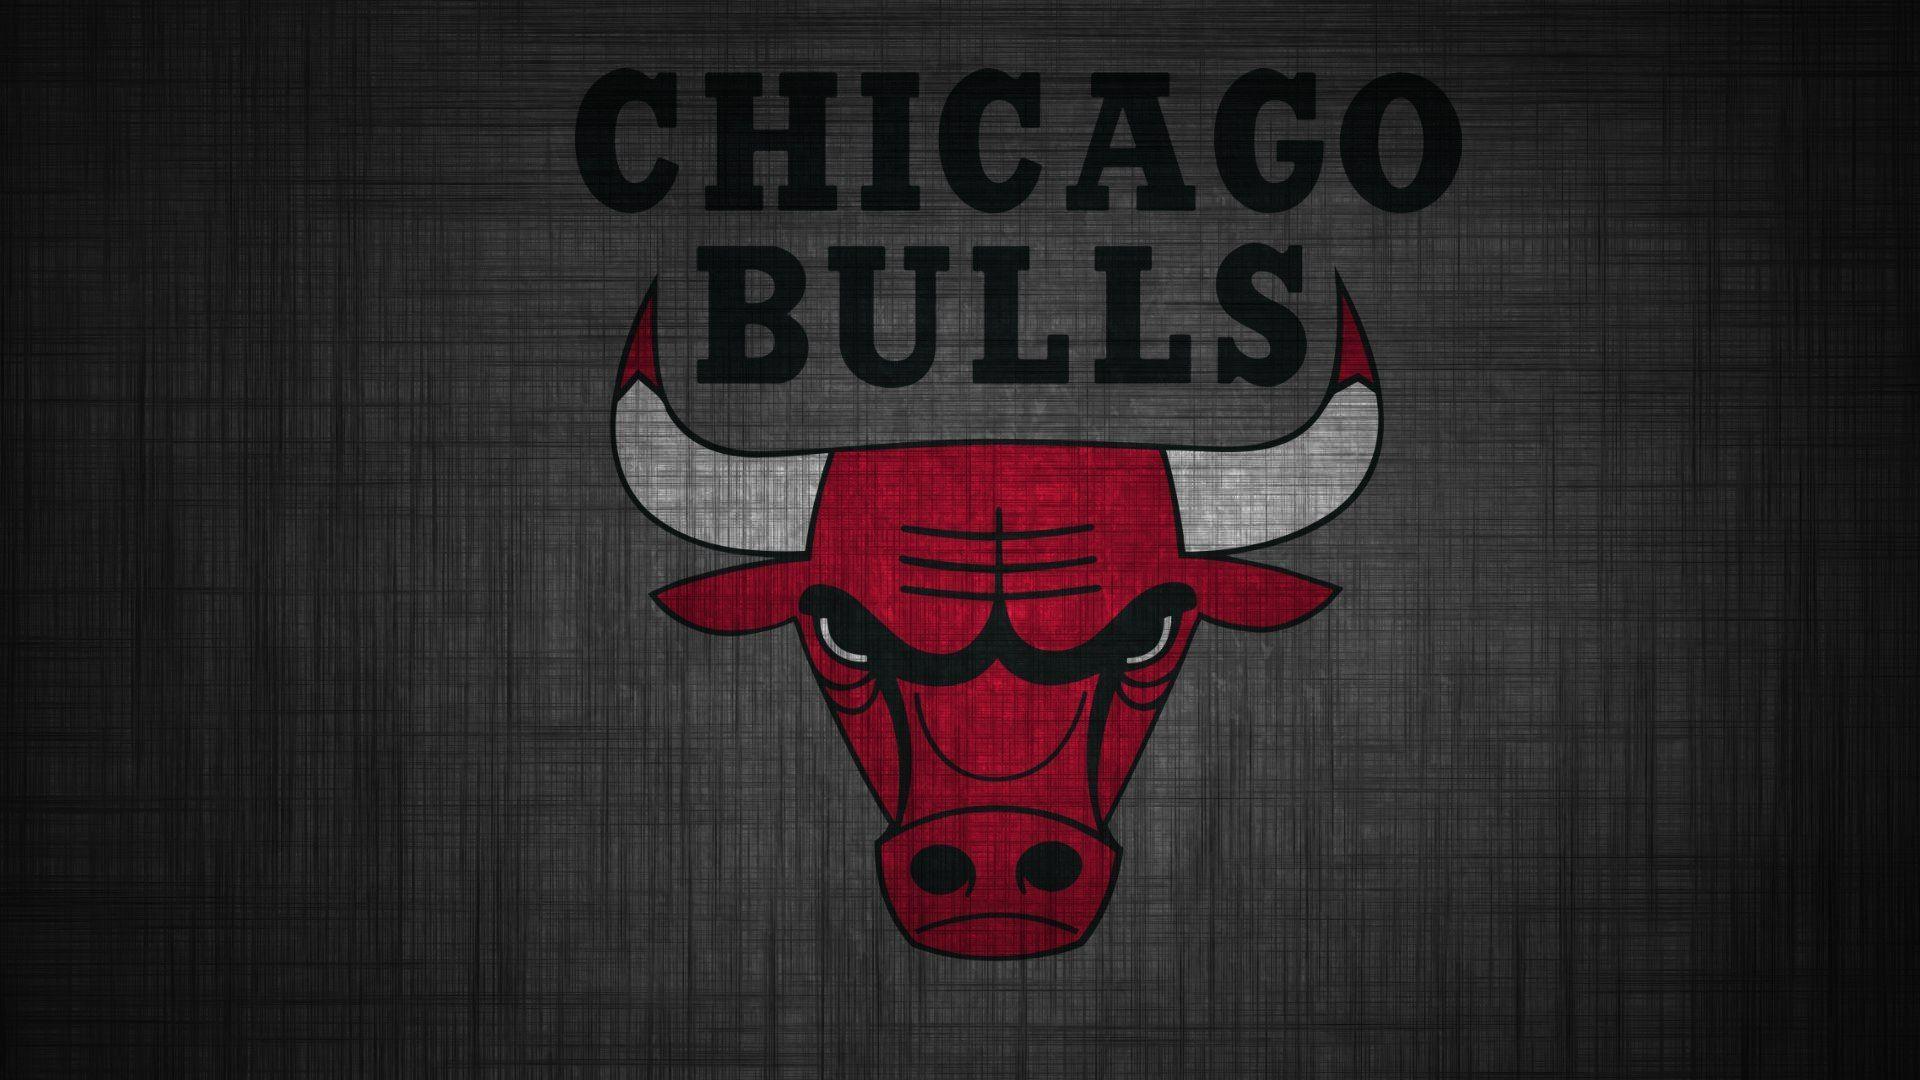 Chicago Bulls Wallpapers Hd Wallpaper Chicago Bulls Wallpaper Bulls Wallpaper Chicago Bulls Logo